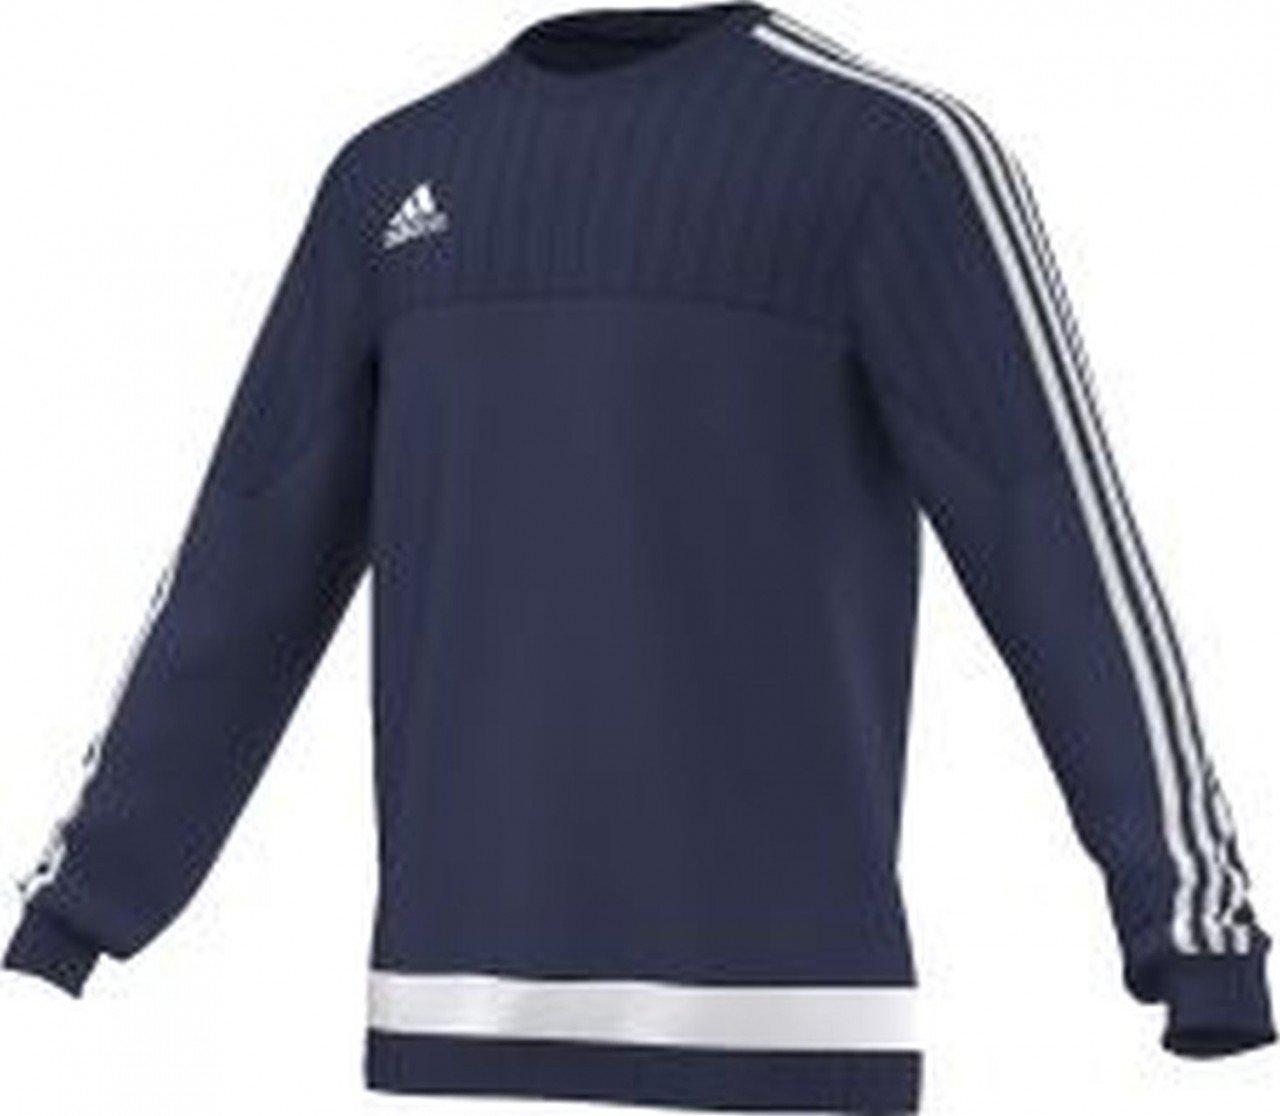 Adidas TIRO15?SWT TOP DkBlue White/DKBLUE Size: S